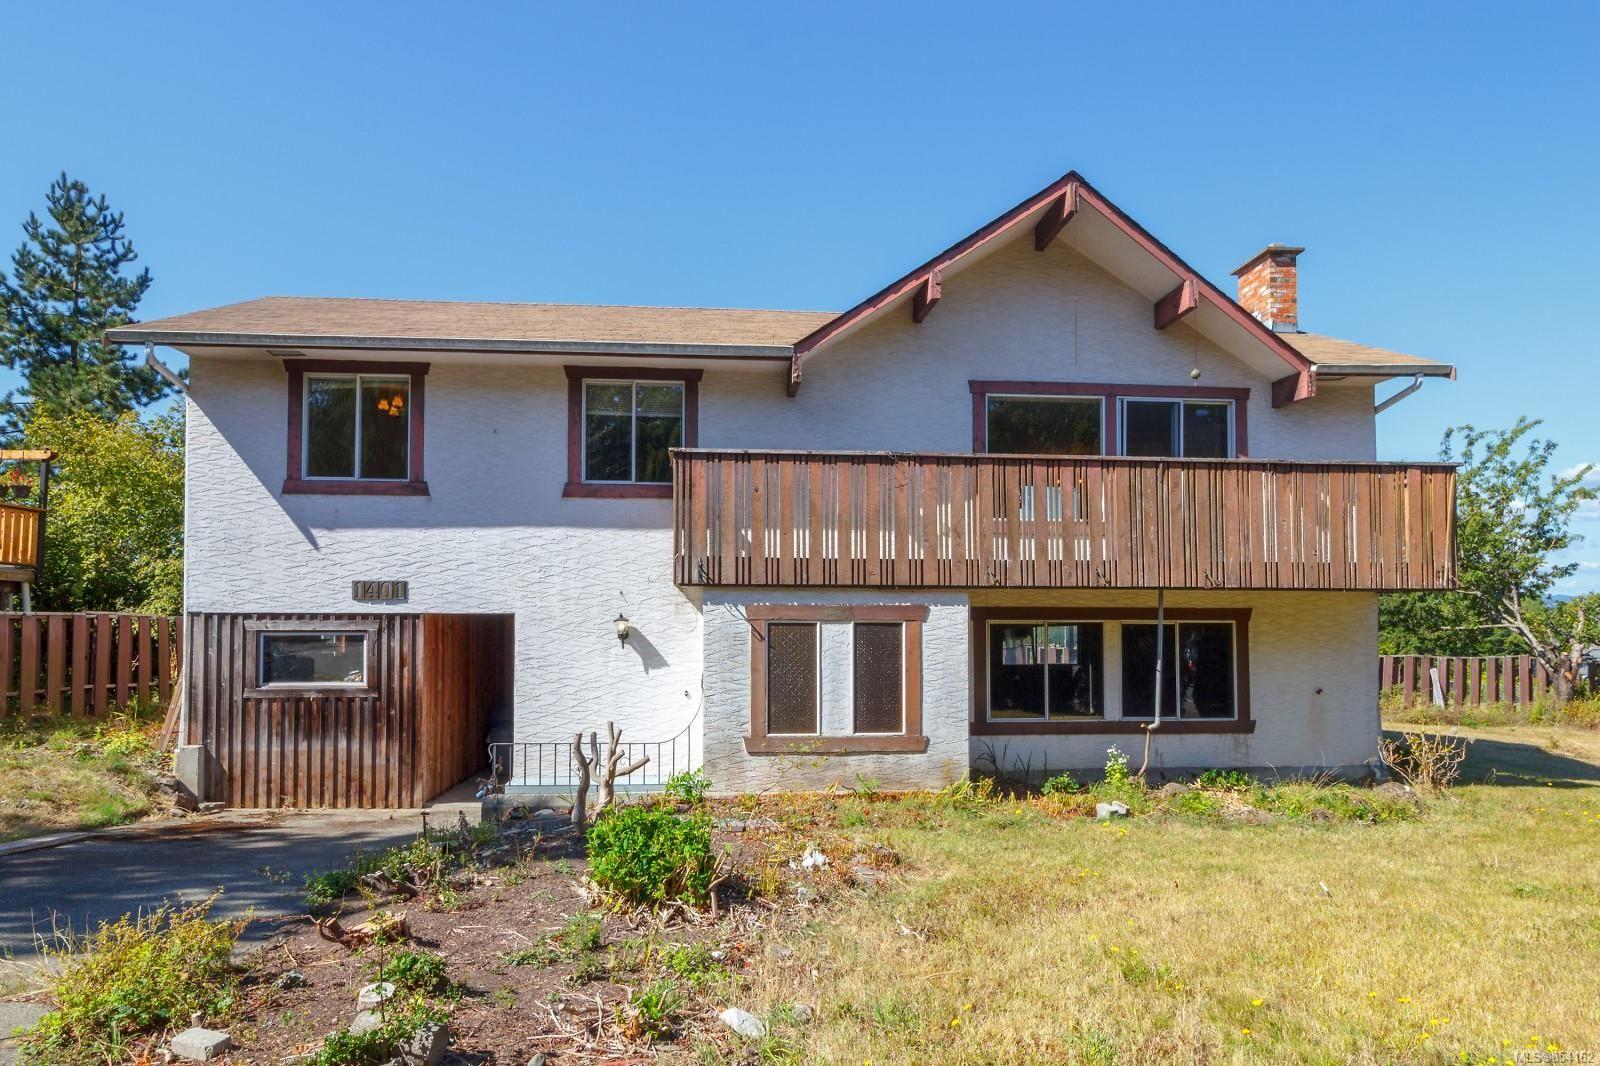 Main Photo: 1401 McKenzie Ave in : SE Cedar Hill House for sale (Saanich East)  : MLS®# 854162